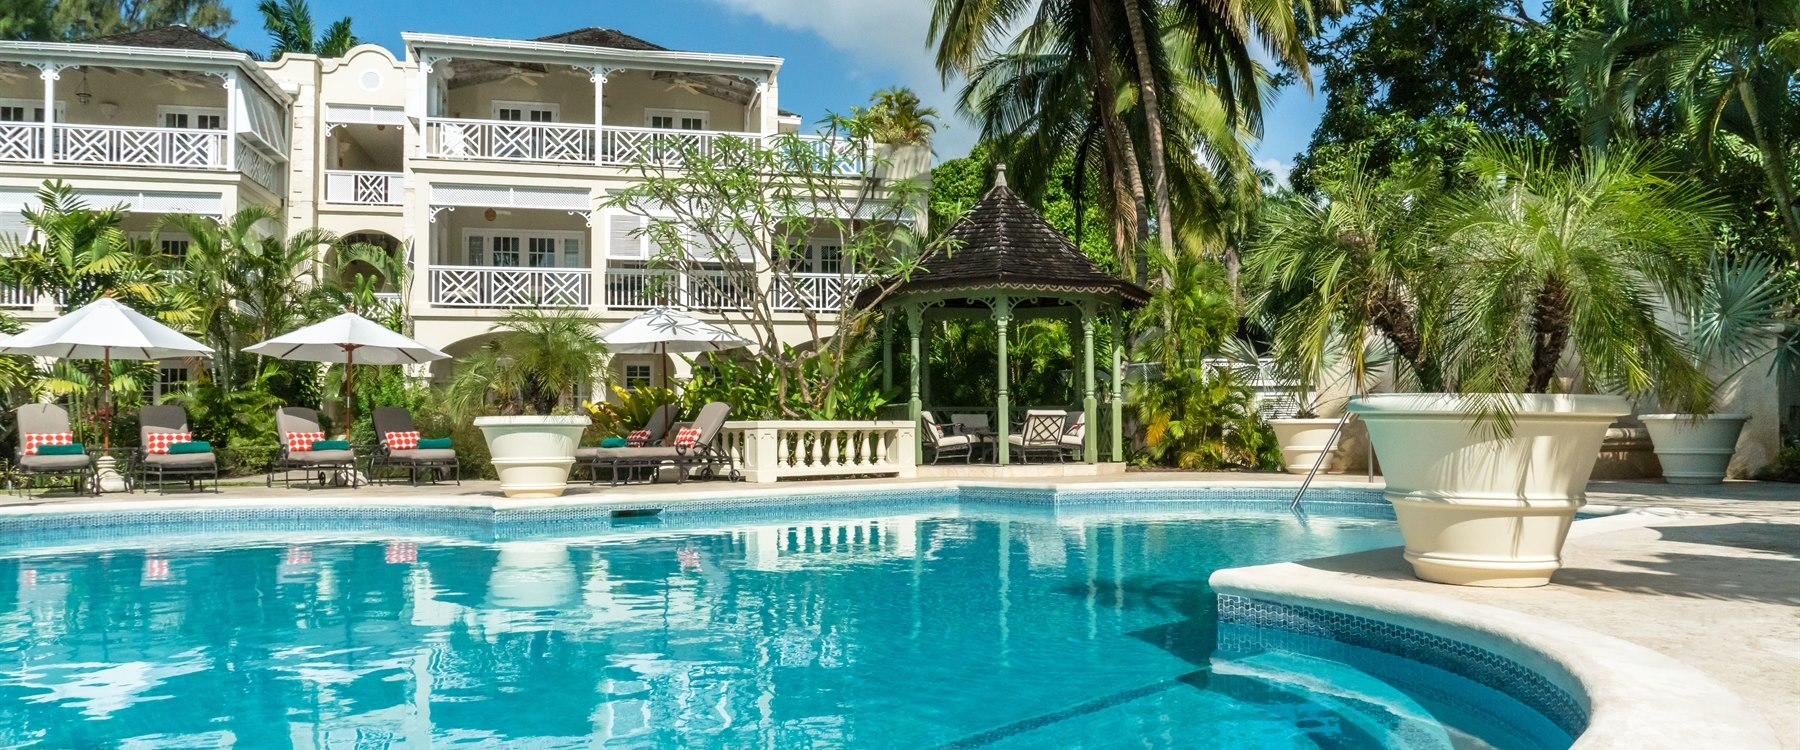 ClubLuxury Plantation Coral Style In Resort Reef Barbados H2WDI9EY